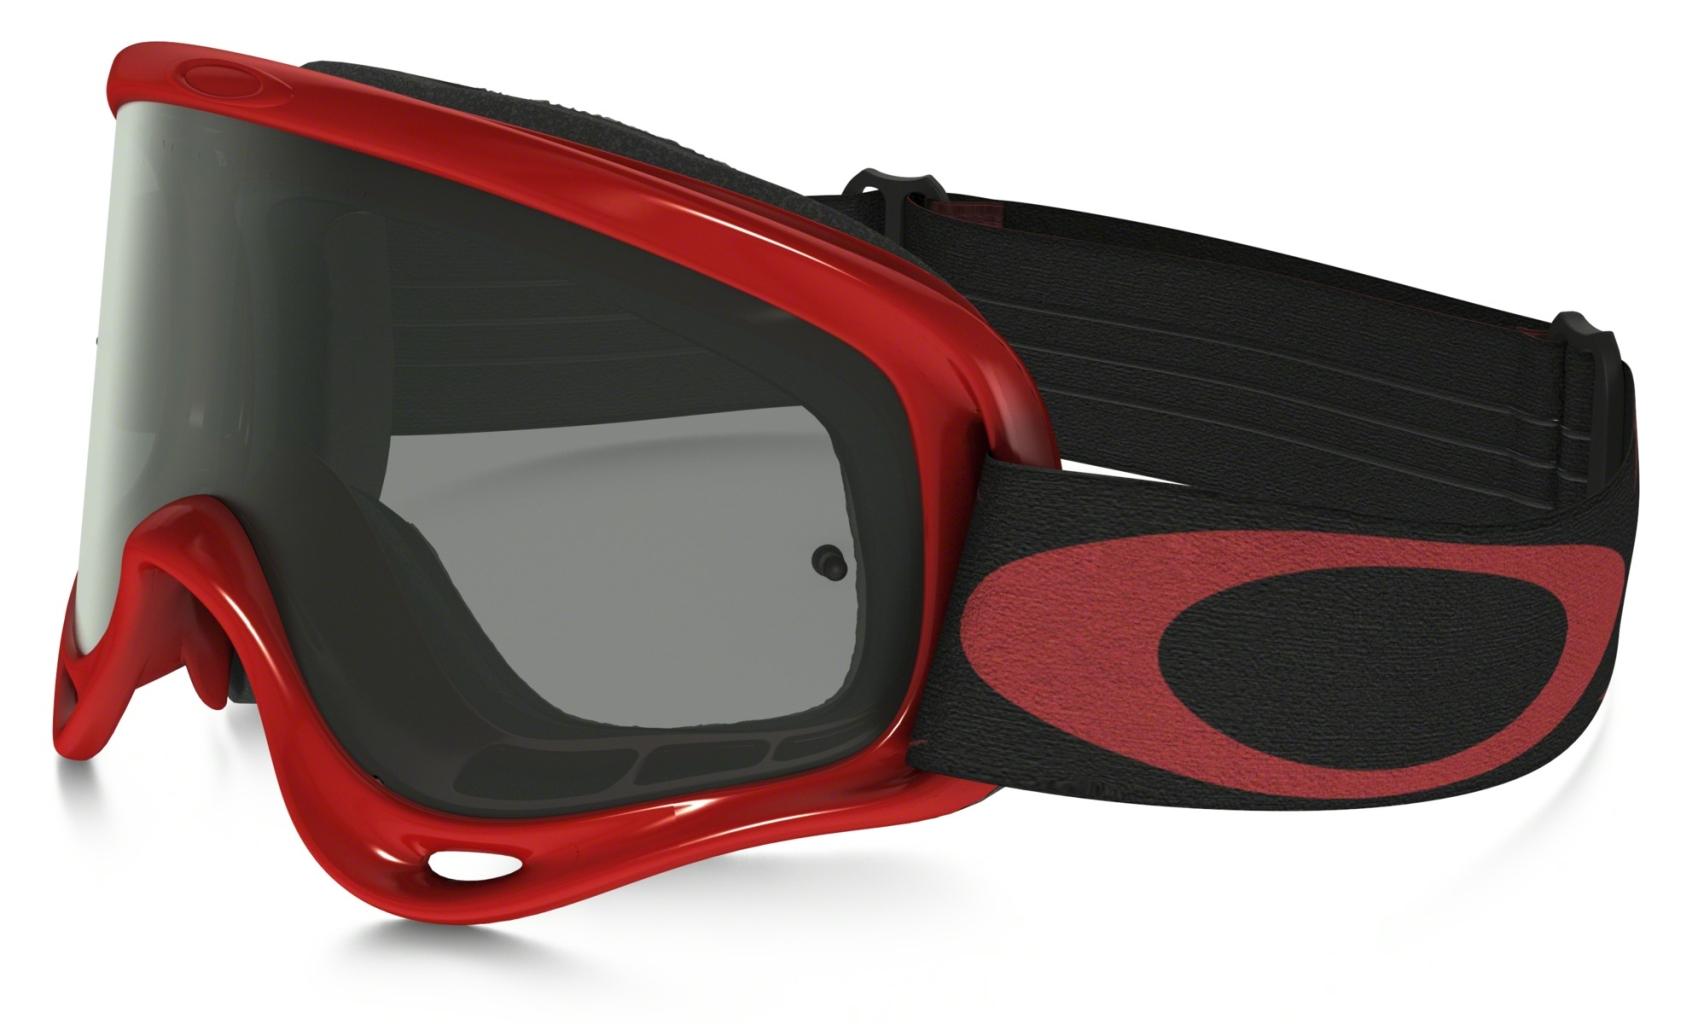 Oakley XS O Frame MX XSMxSandHighVoltageRedw/DkGry&Clr-30